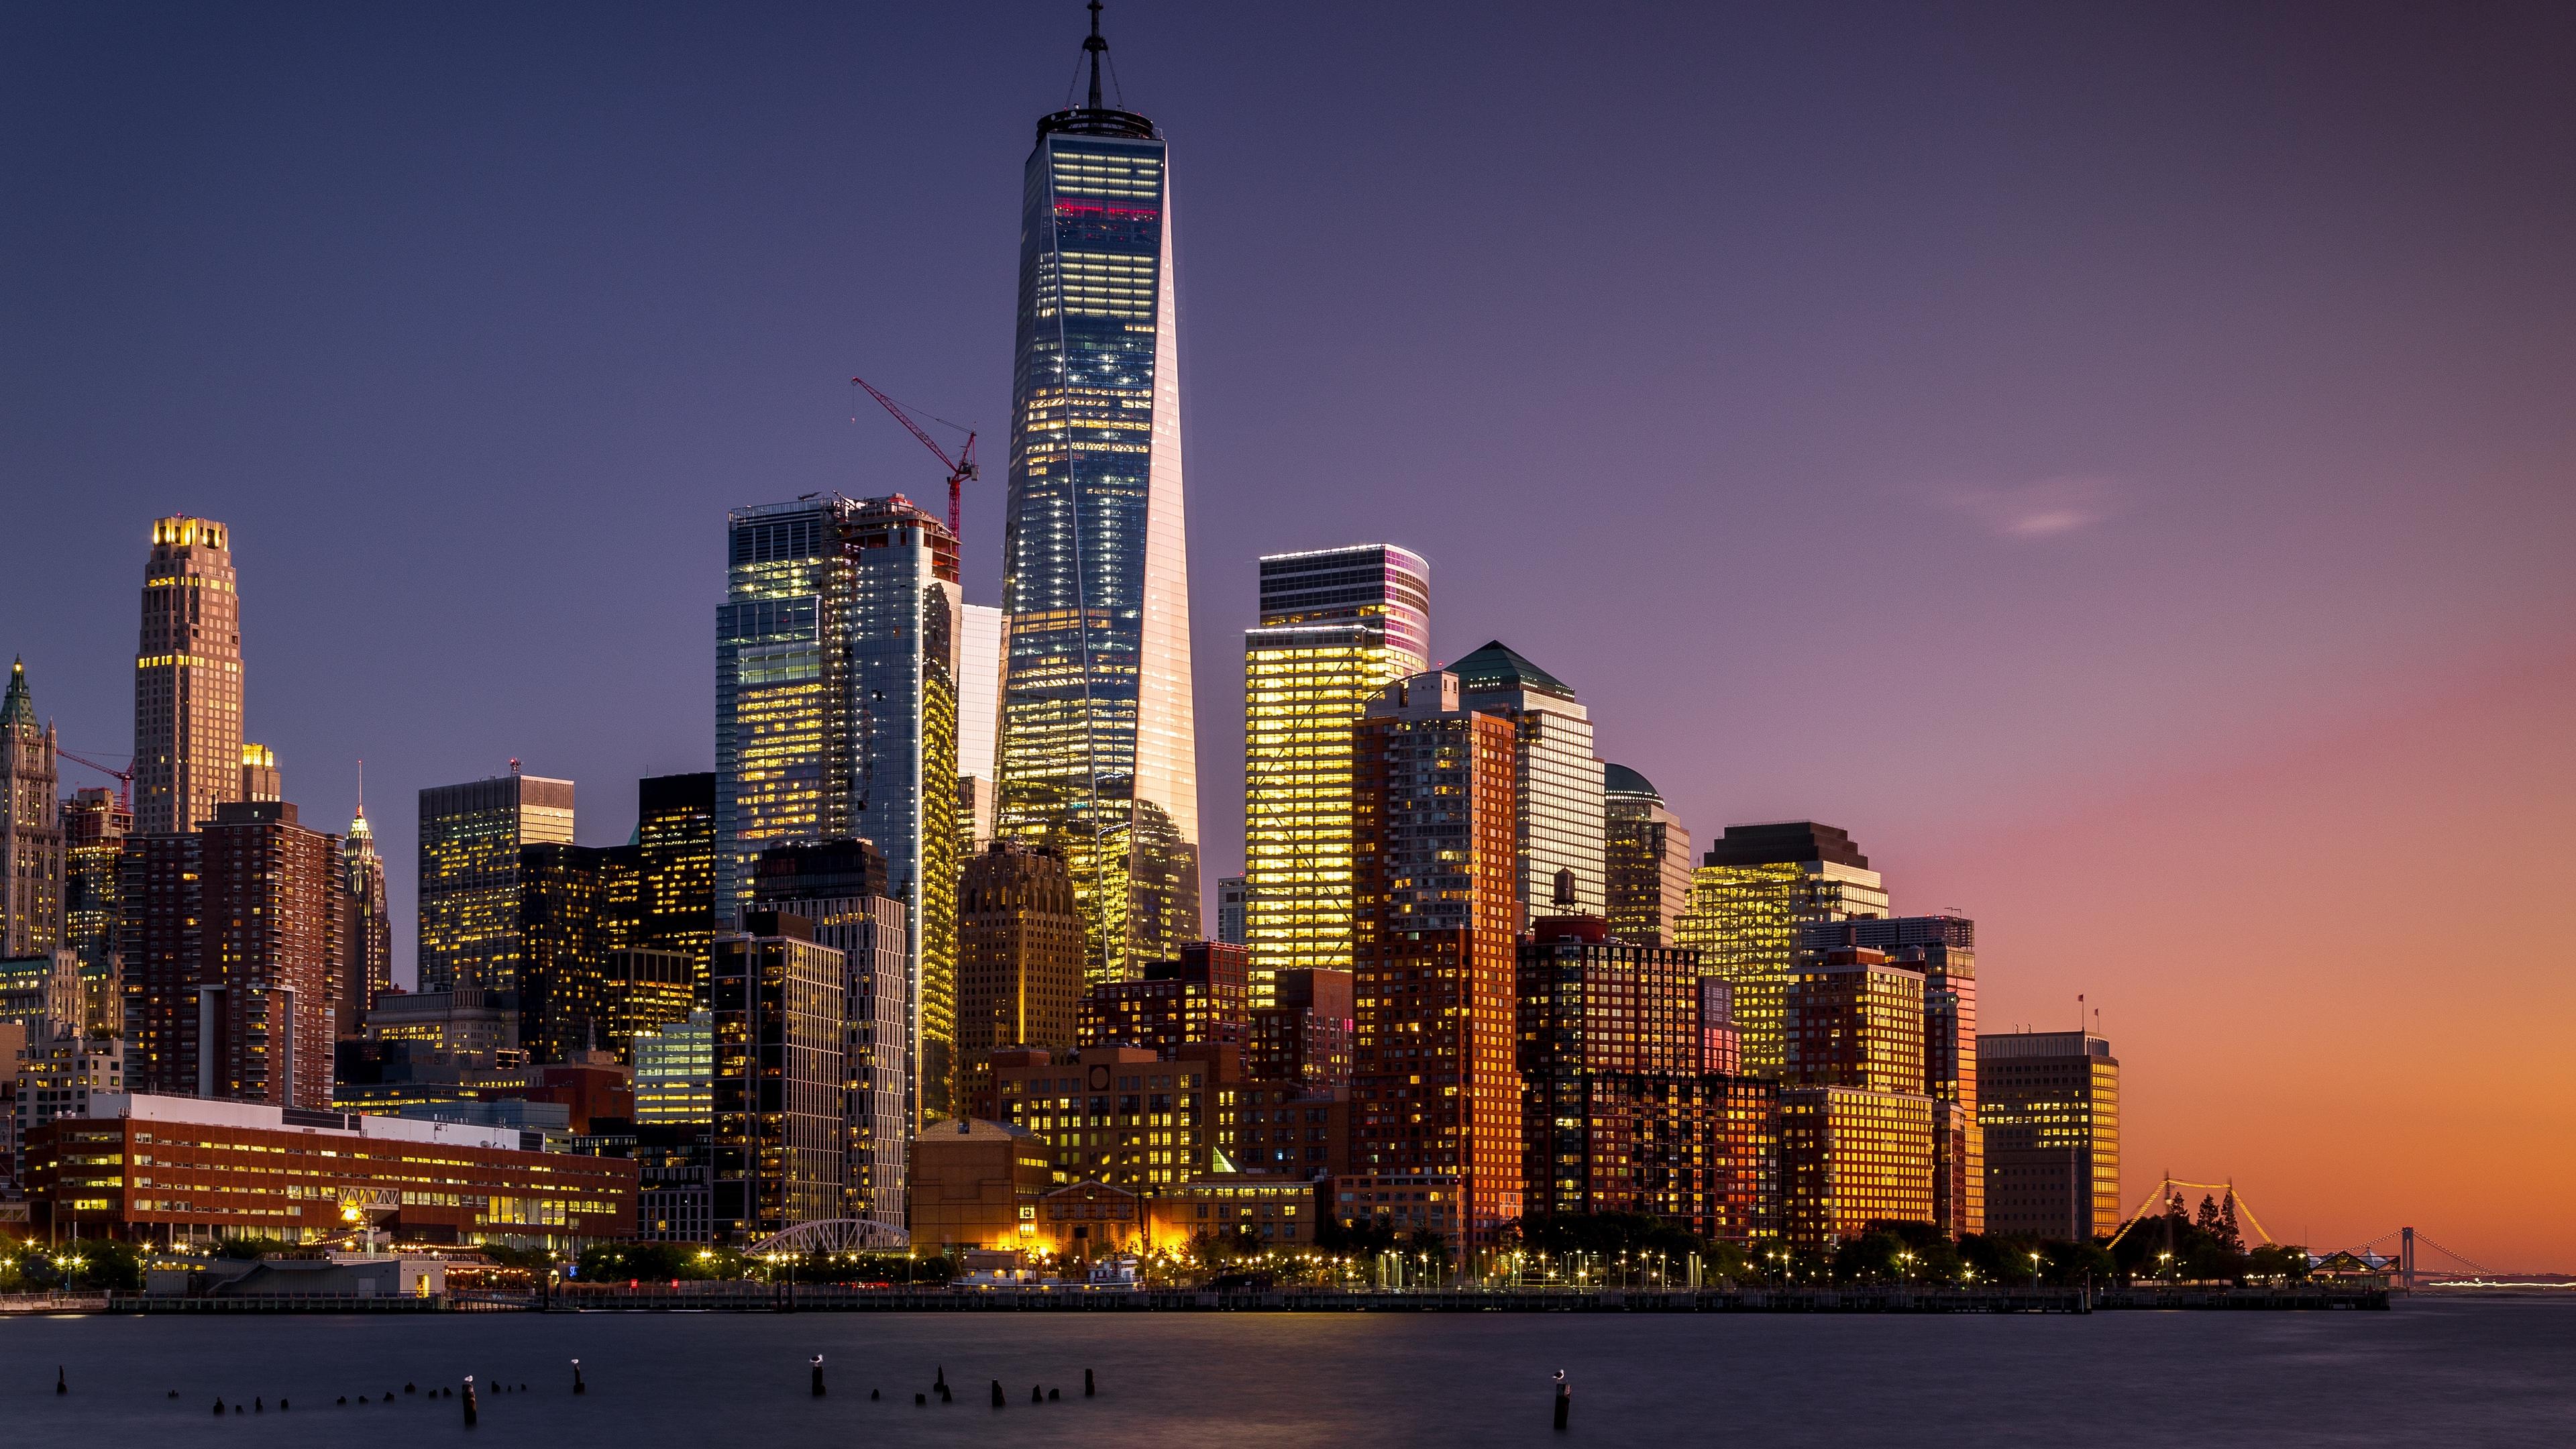 manhattan new york usa skyscrapers 4k 1538066429 - manhattan, new york, usa, skyscrapers 4k - USA, new york, Manhattan